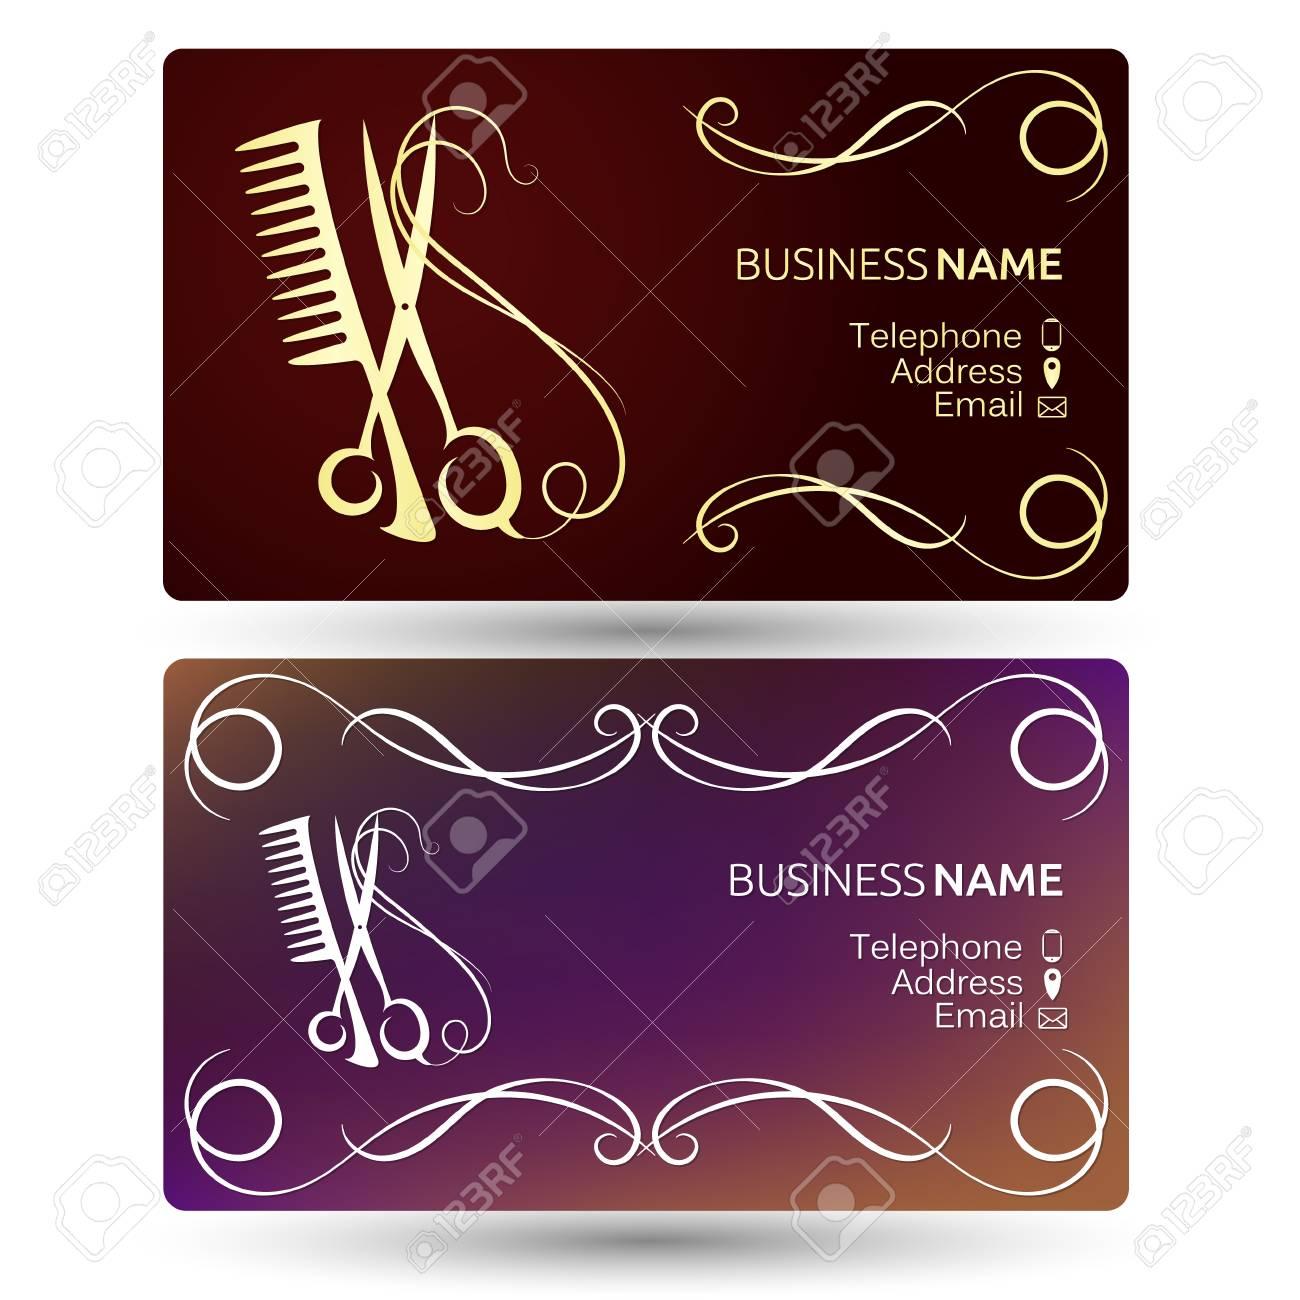 Beauty salon and hairdresser business card template vector royalty beauty salon and hairdresser business card template vector stock vector 73790269 colourmoves